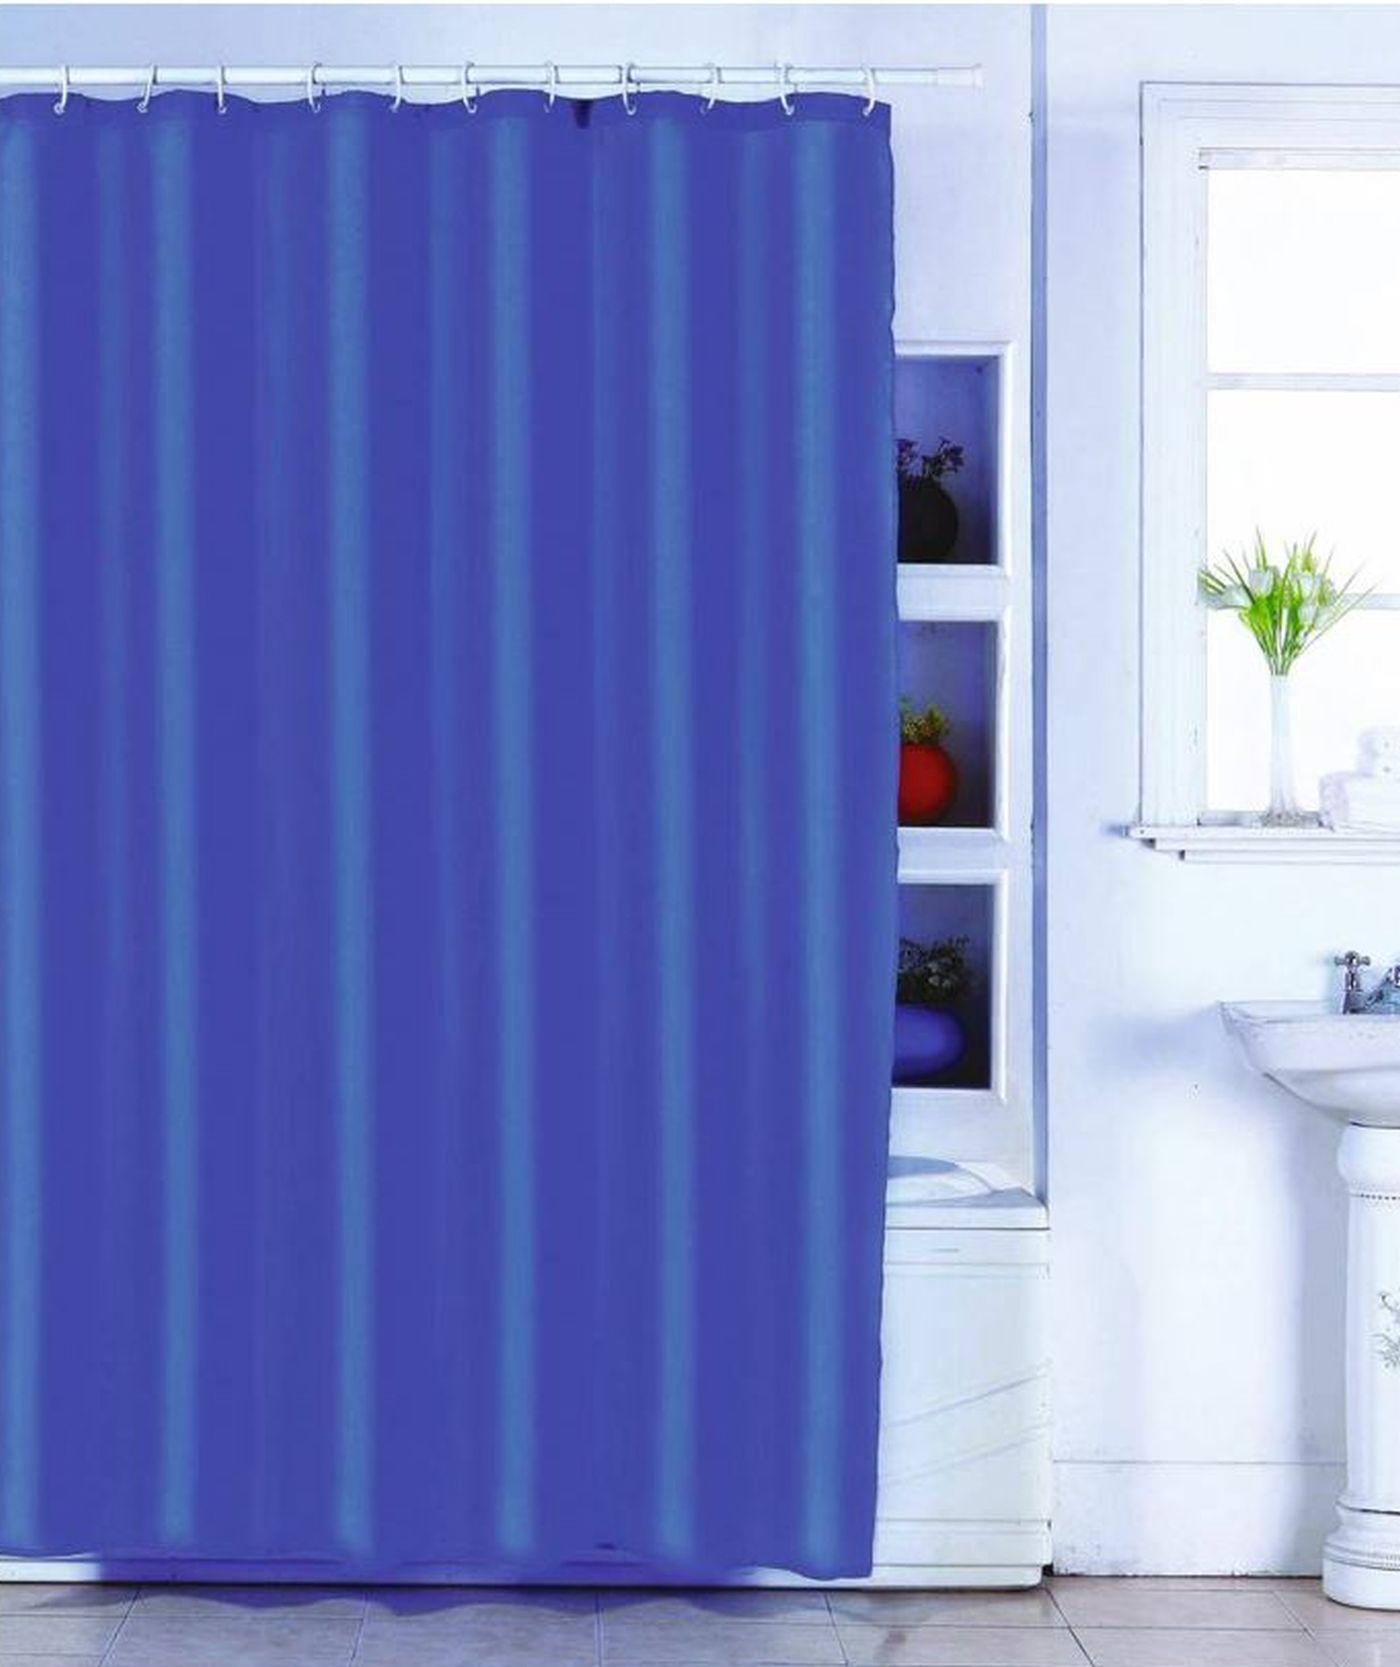 MSV Duschvorhang 180x200cm Anti Schimmel Textil Badewannenvorhang Wannenvorhang Blau